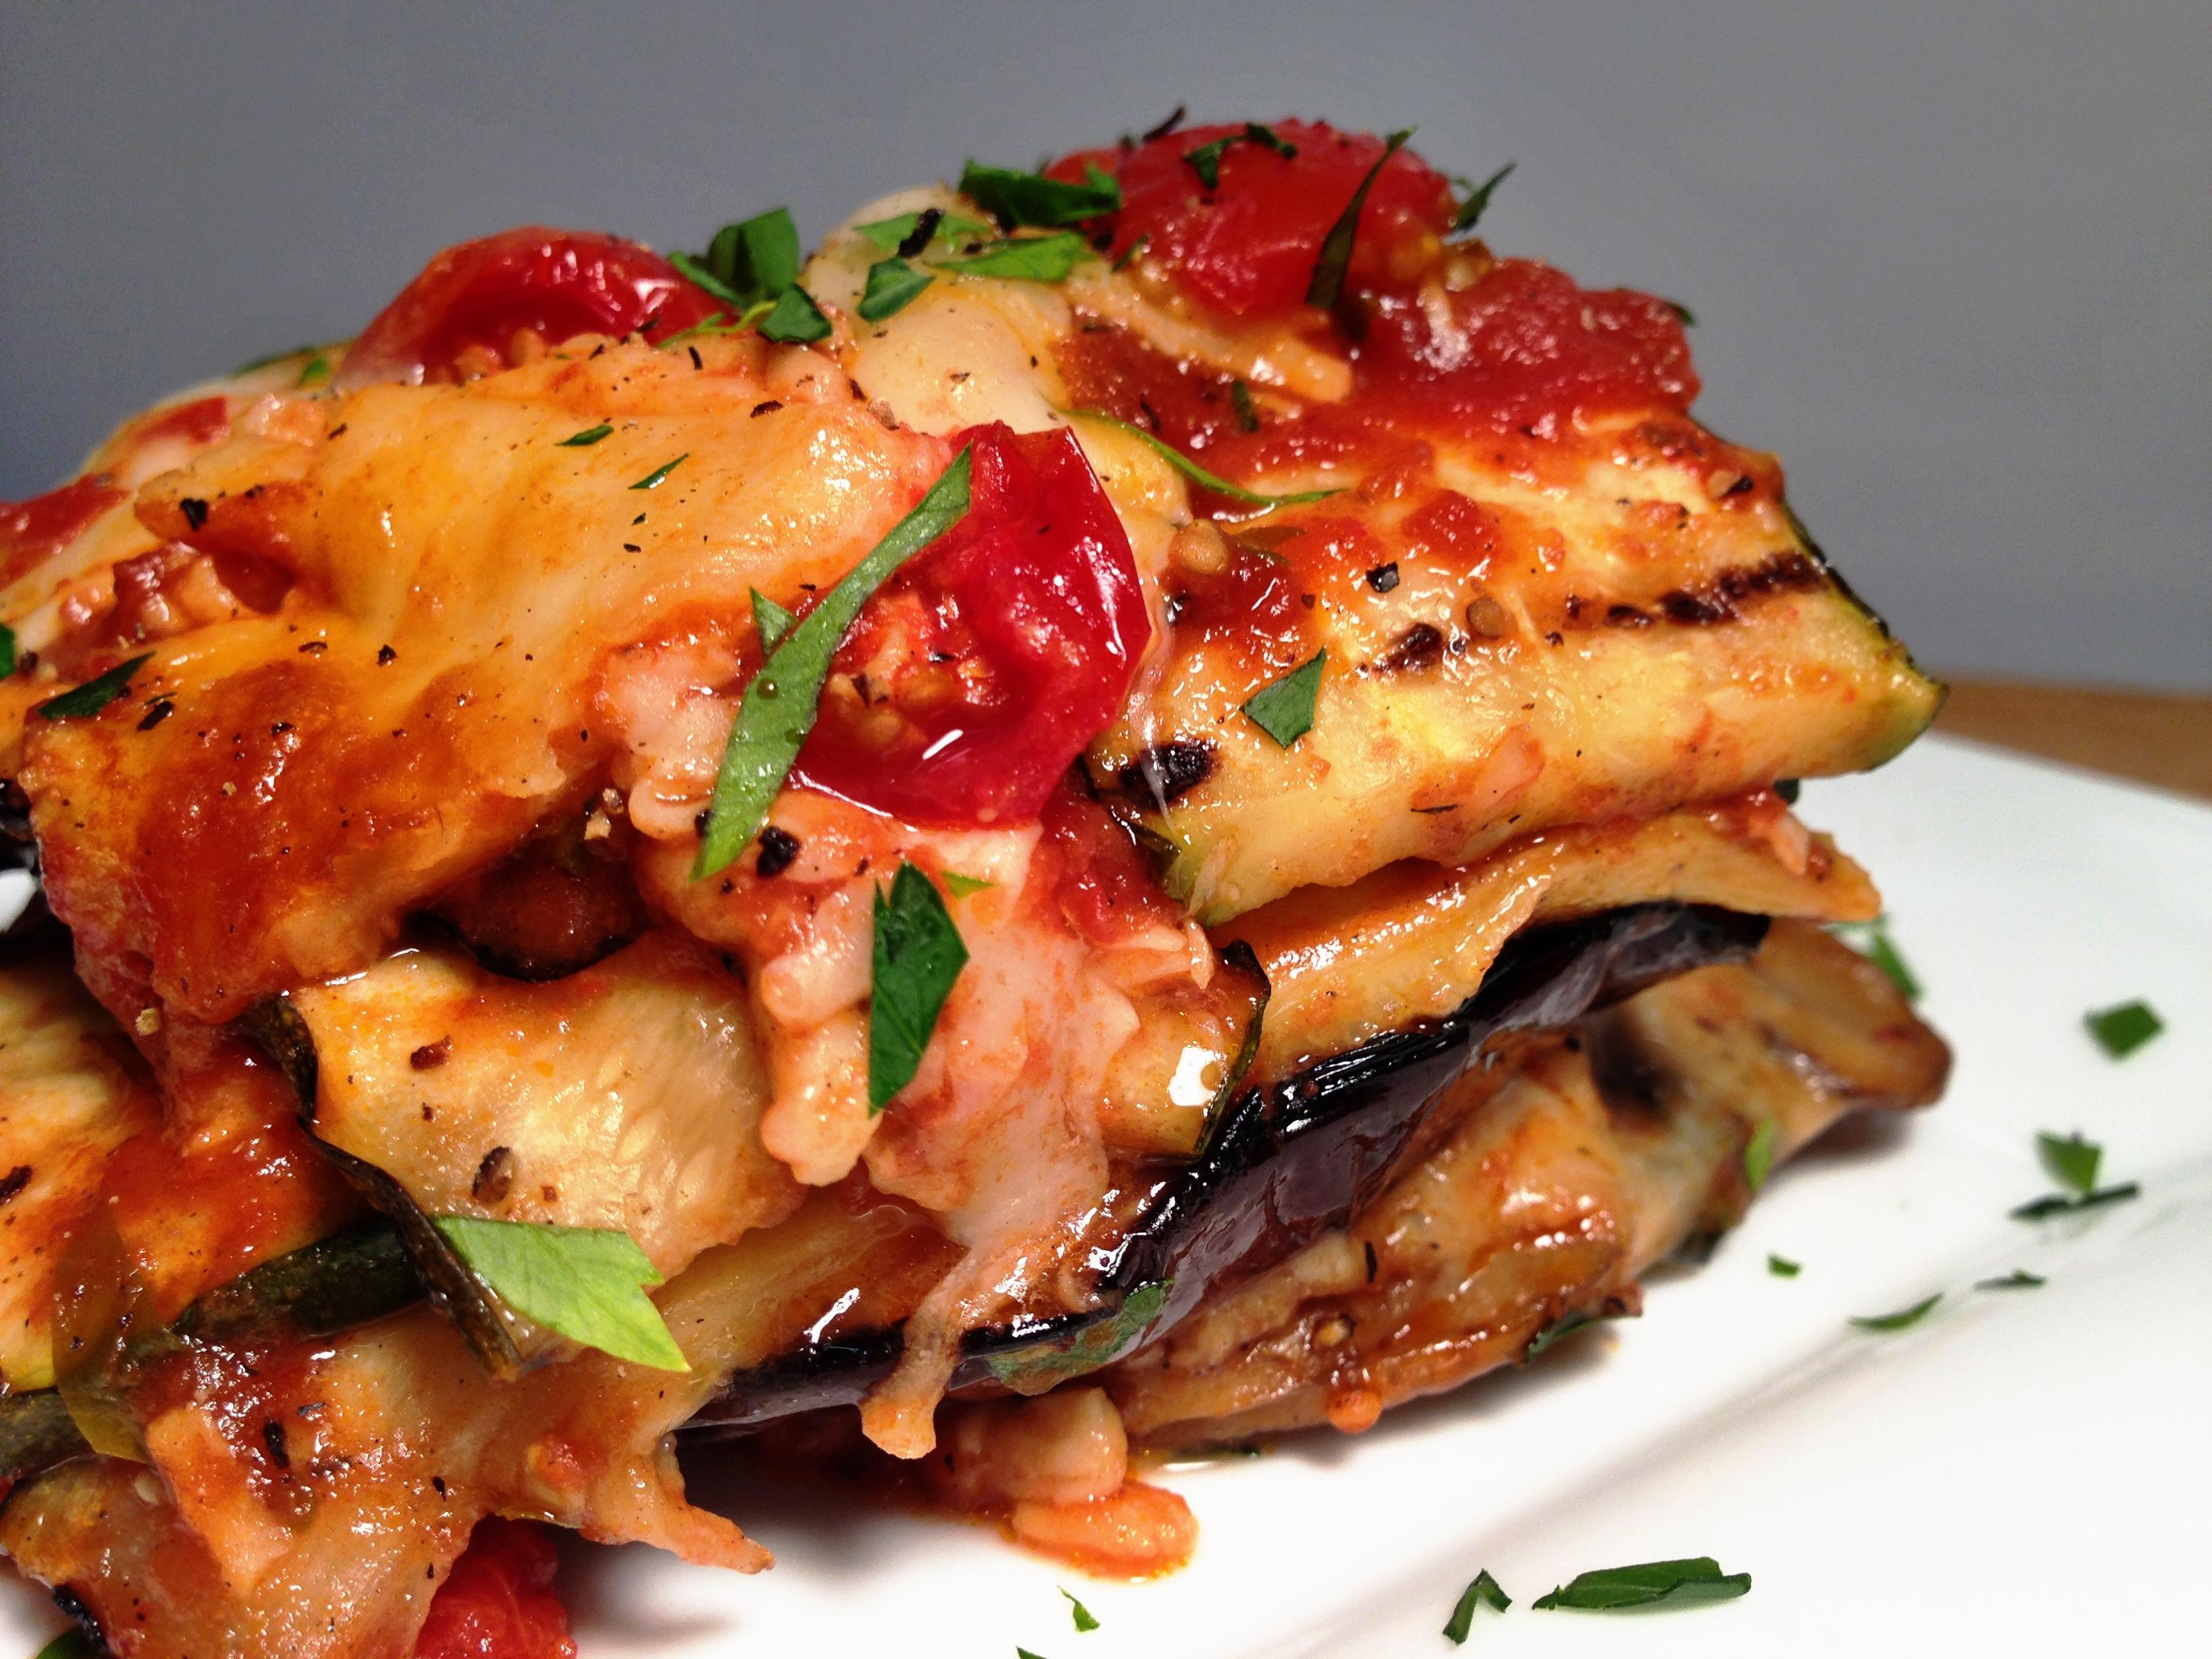 NoCarb NoPasta Grilled Garden Vegetable Lasagna with